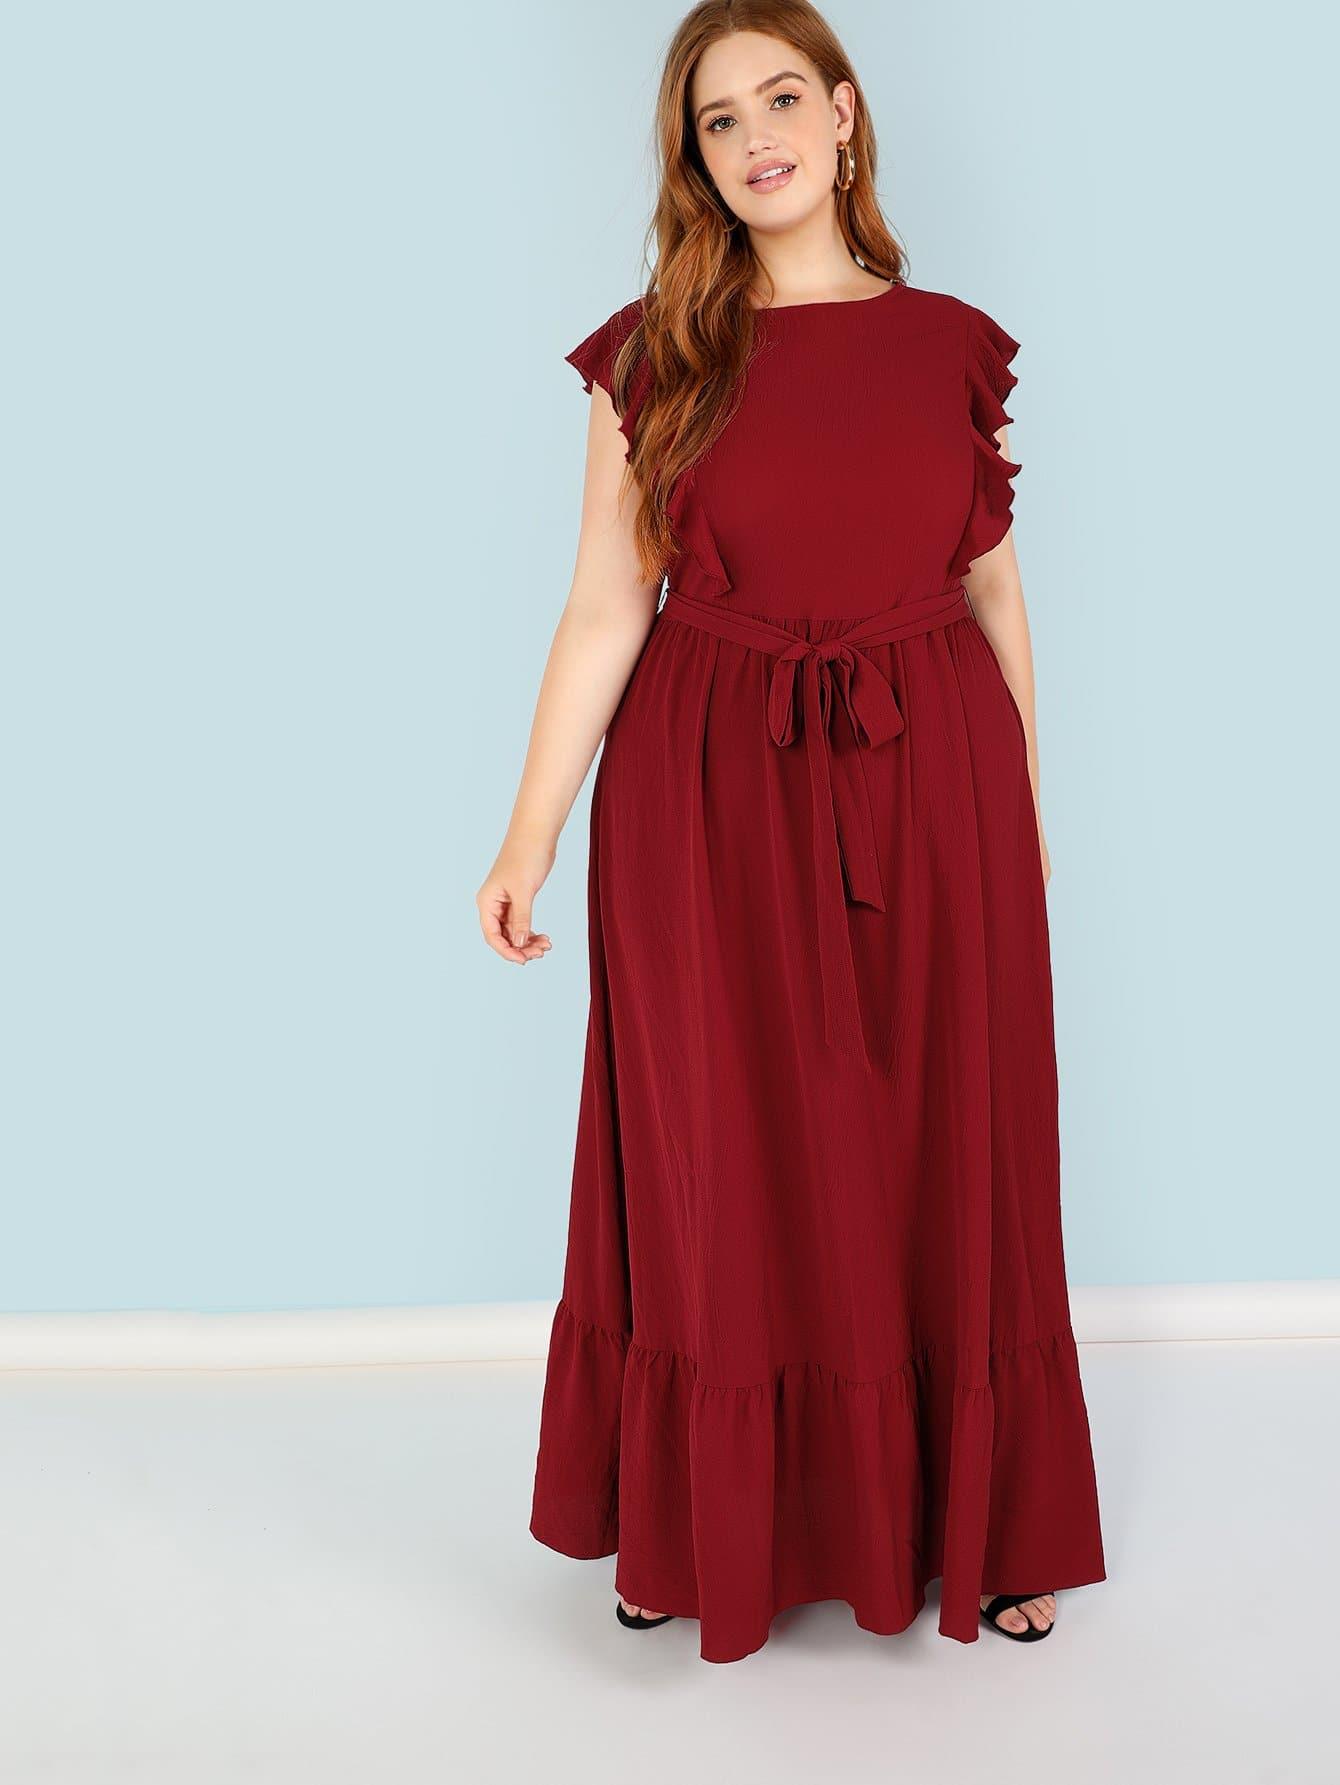 Plus Self Belted Ruffle Trim Dress self belted solid ruffle trim dress